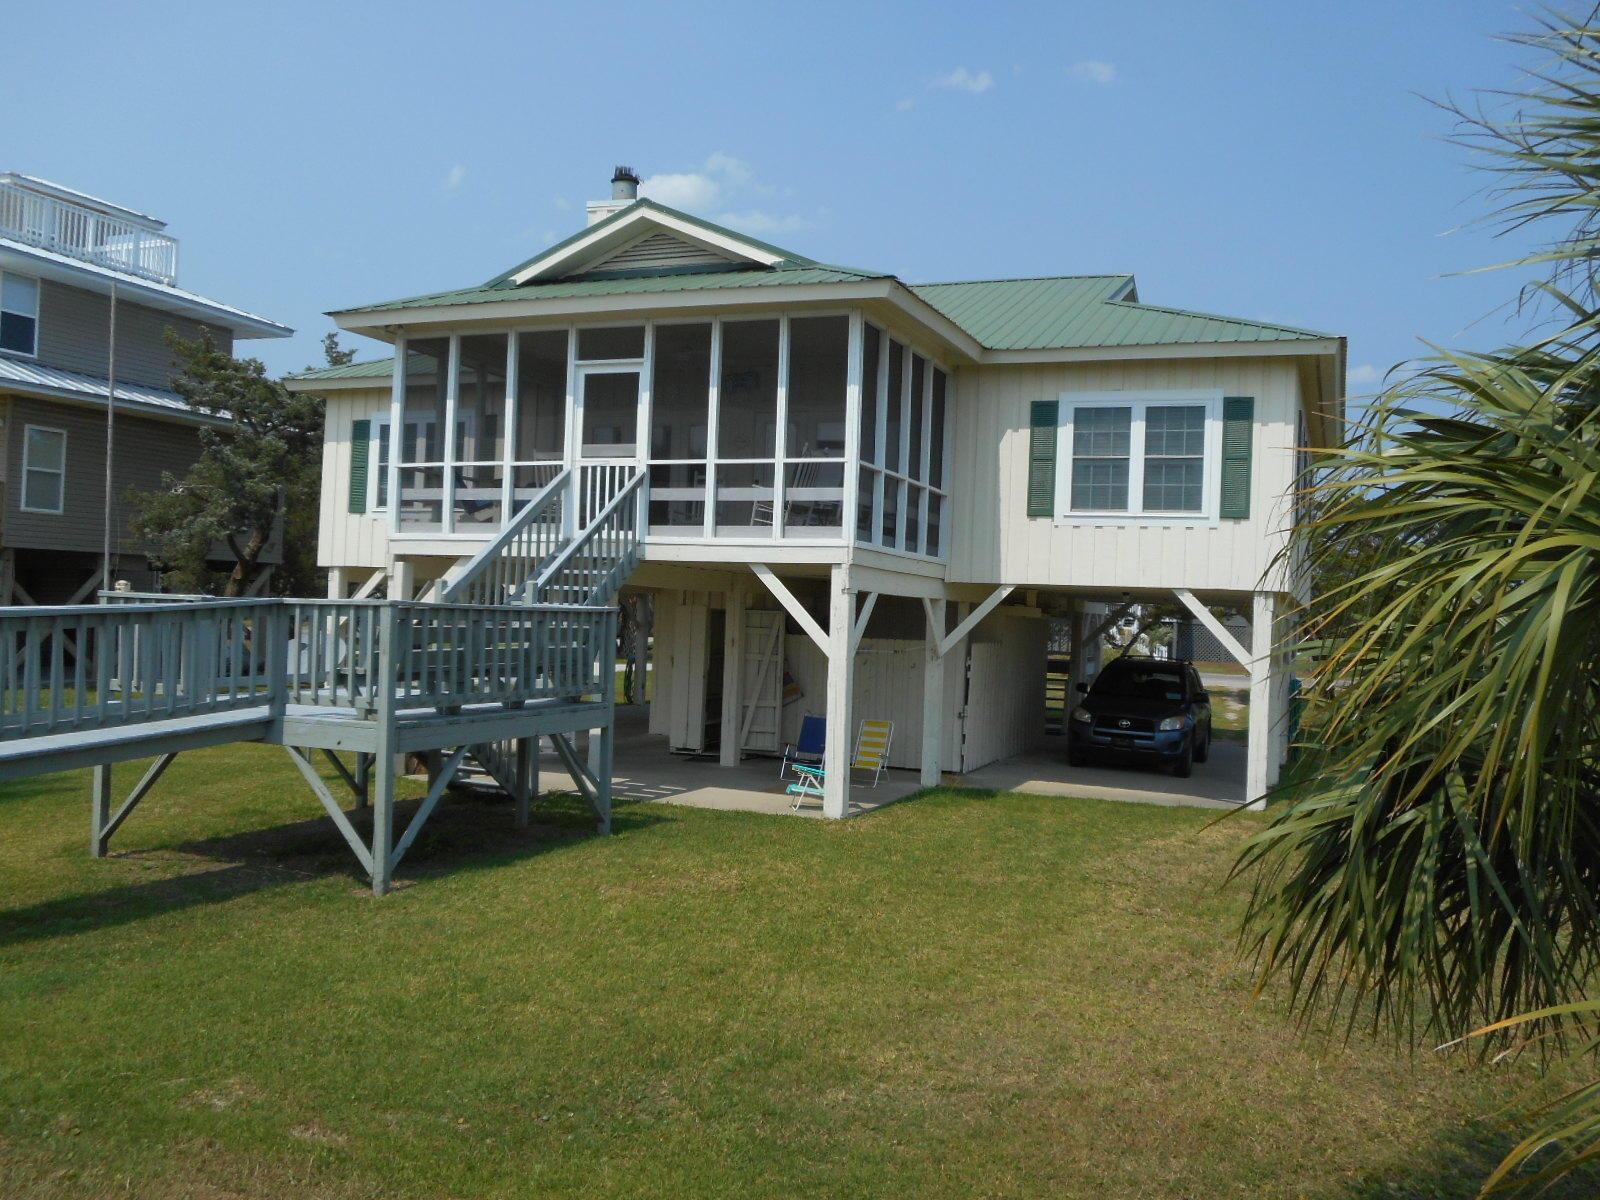 Beachfront Homes For Sale - 3608 Yacht Club, Edisto Beach, SC - 5